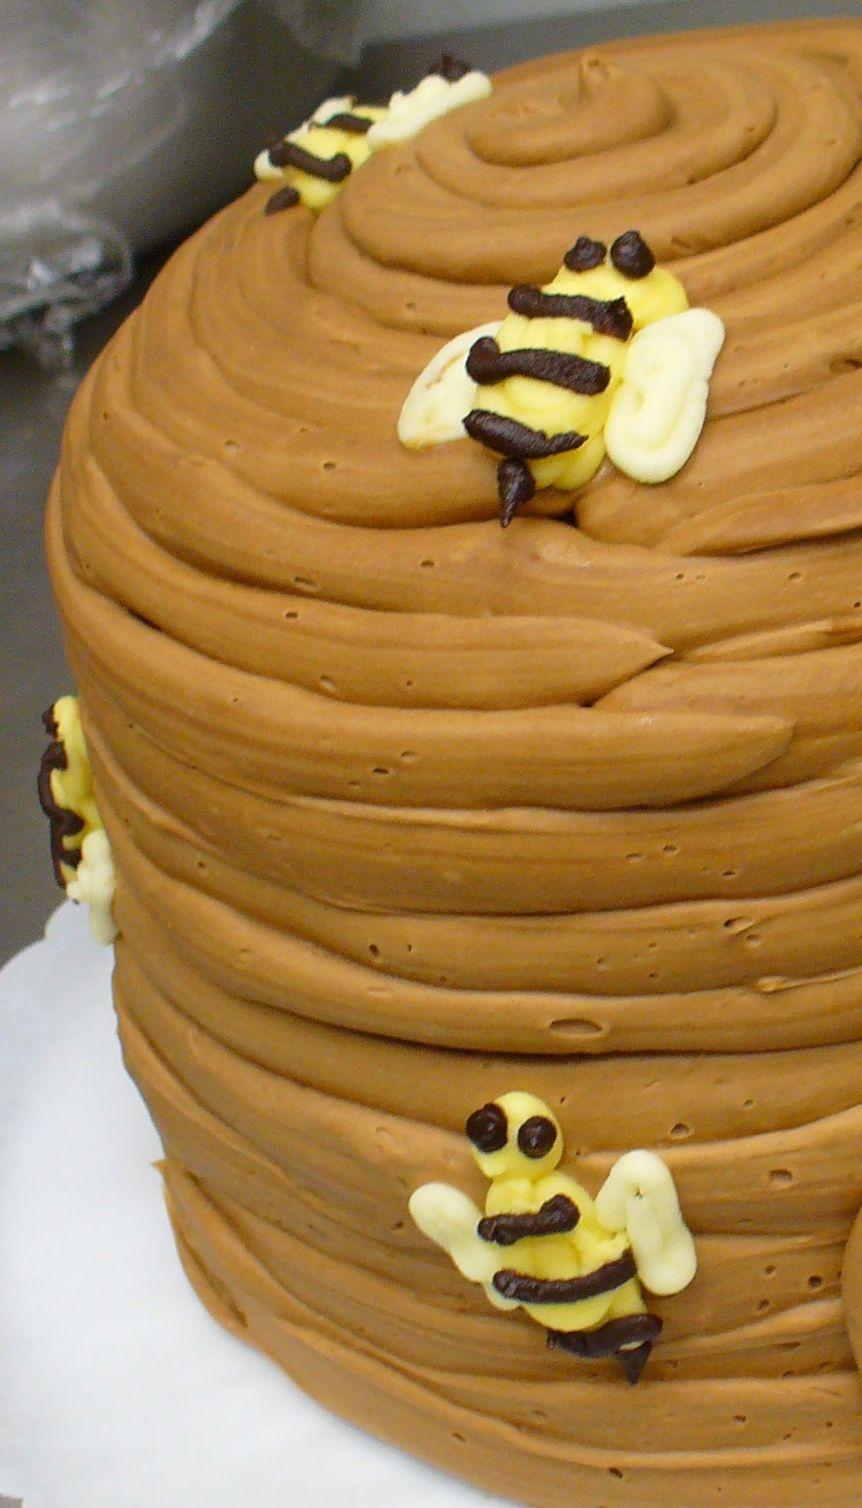 CU41 beehive.jpg